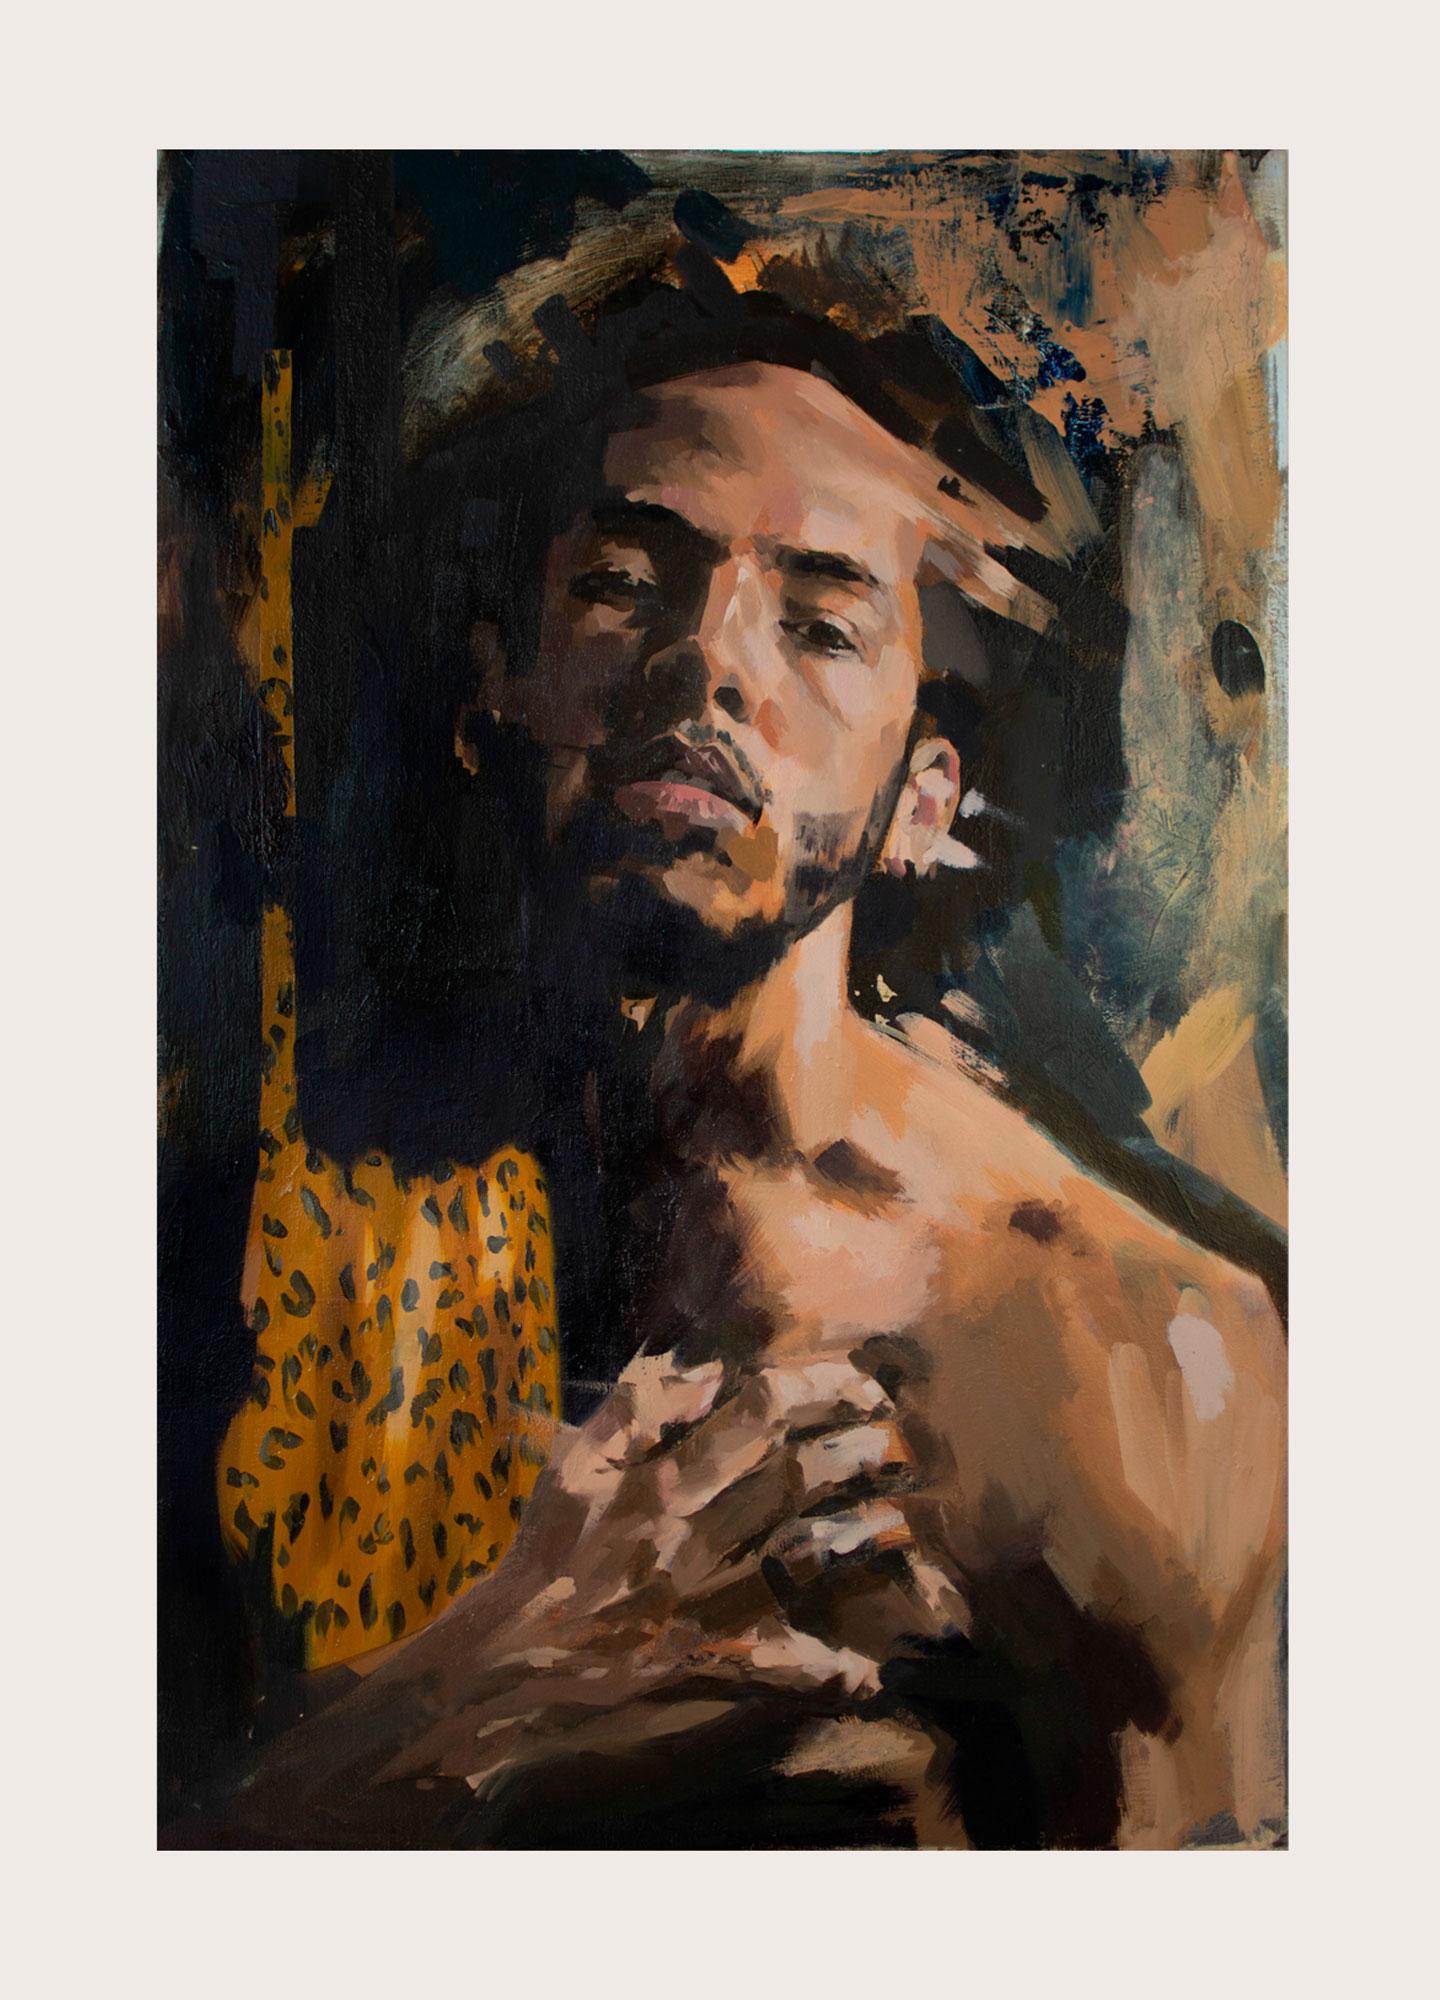 My Release | Oil on canvas board | 30 x 20 in